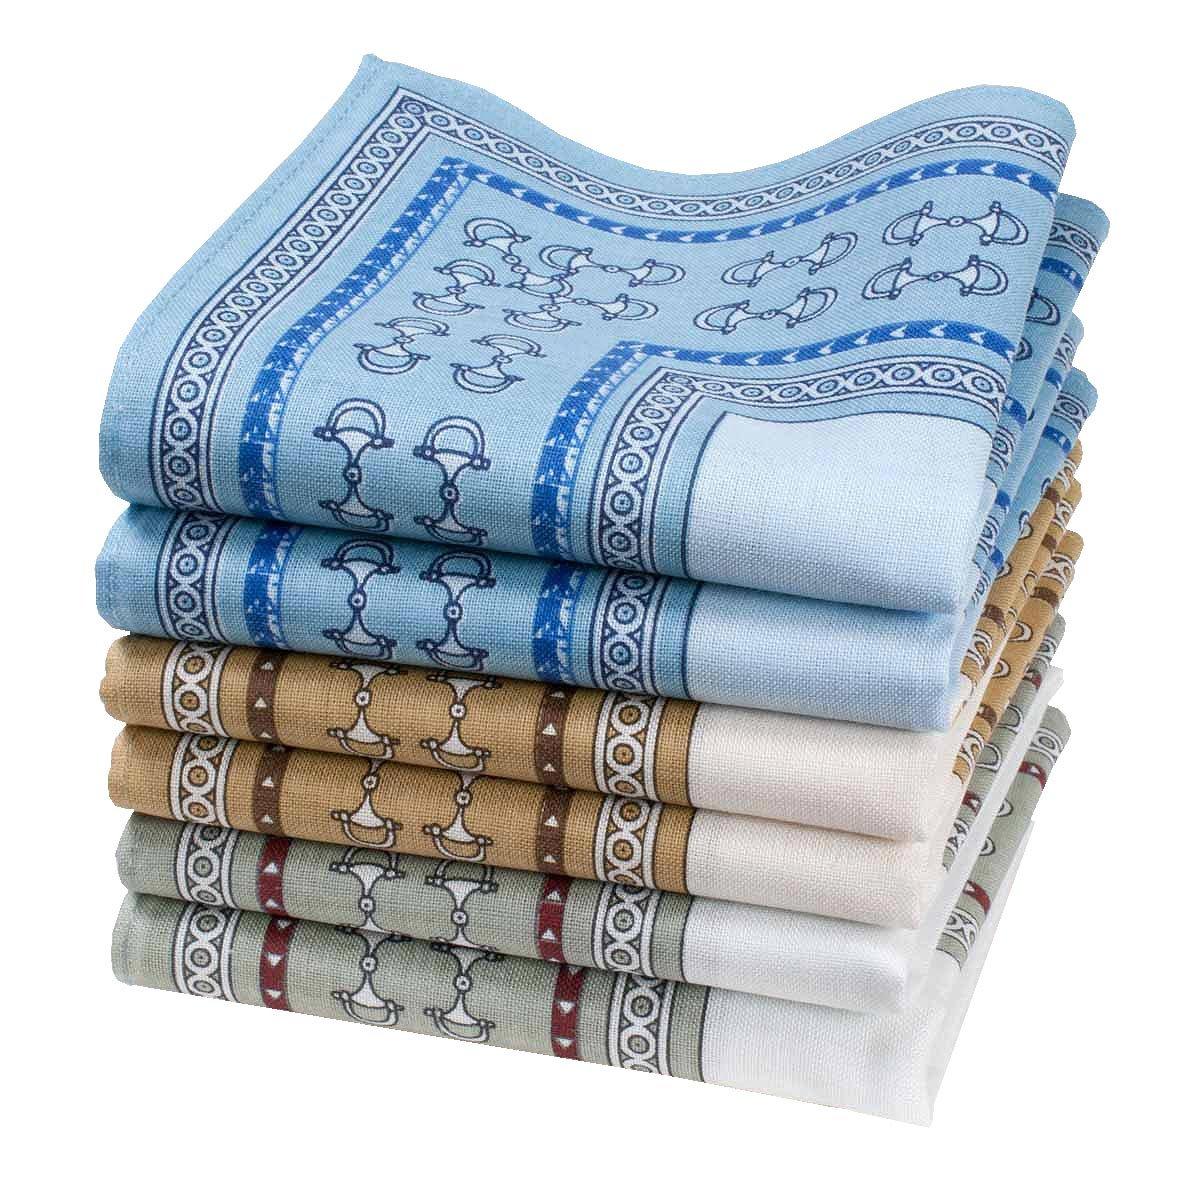 """Chachapoya"" men's handkerchiefs - 14"" square - 6 units in a bag."